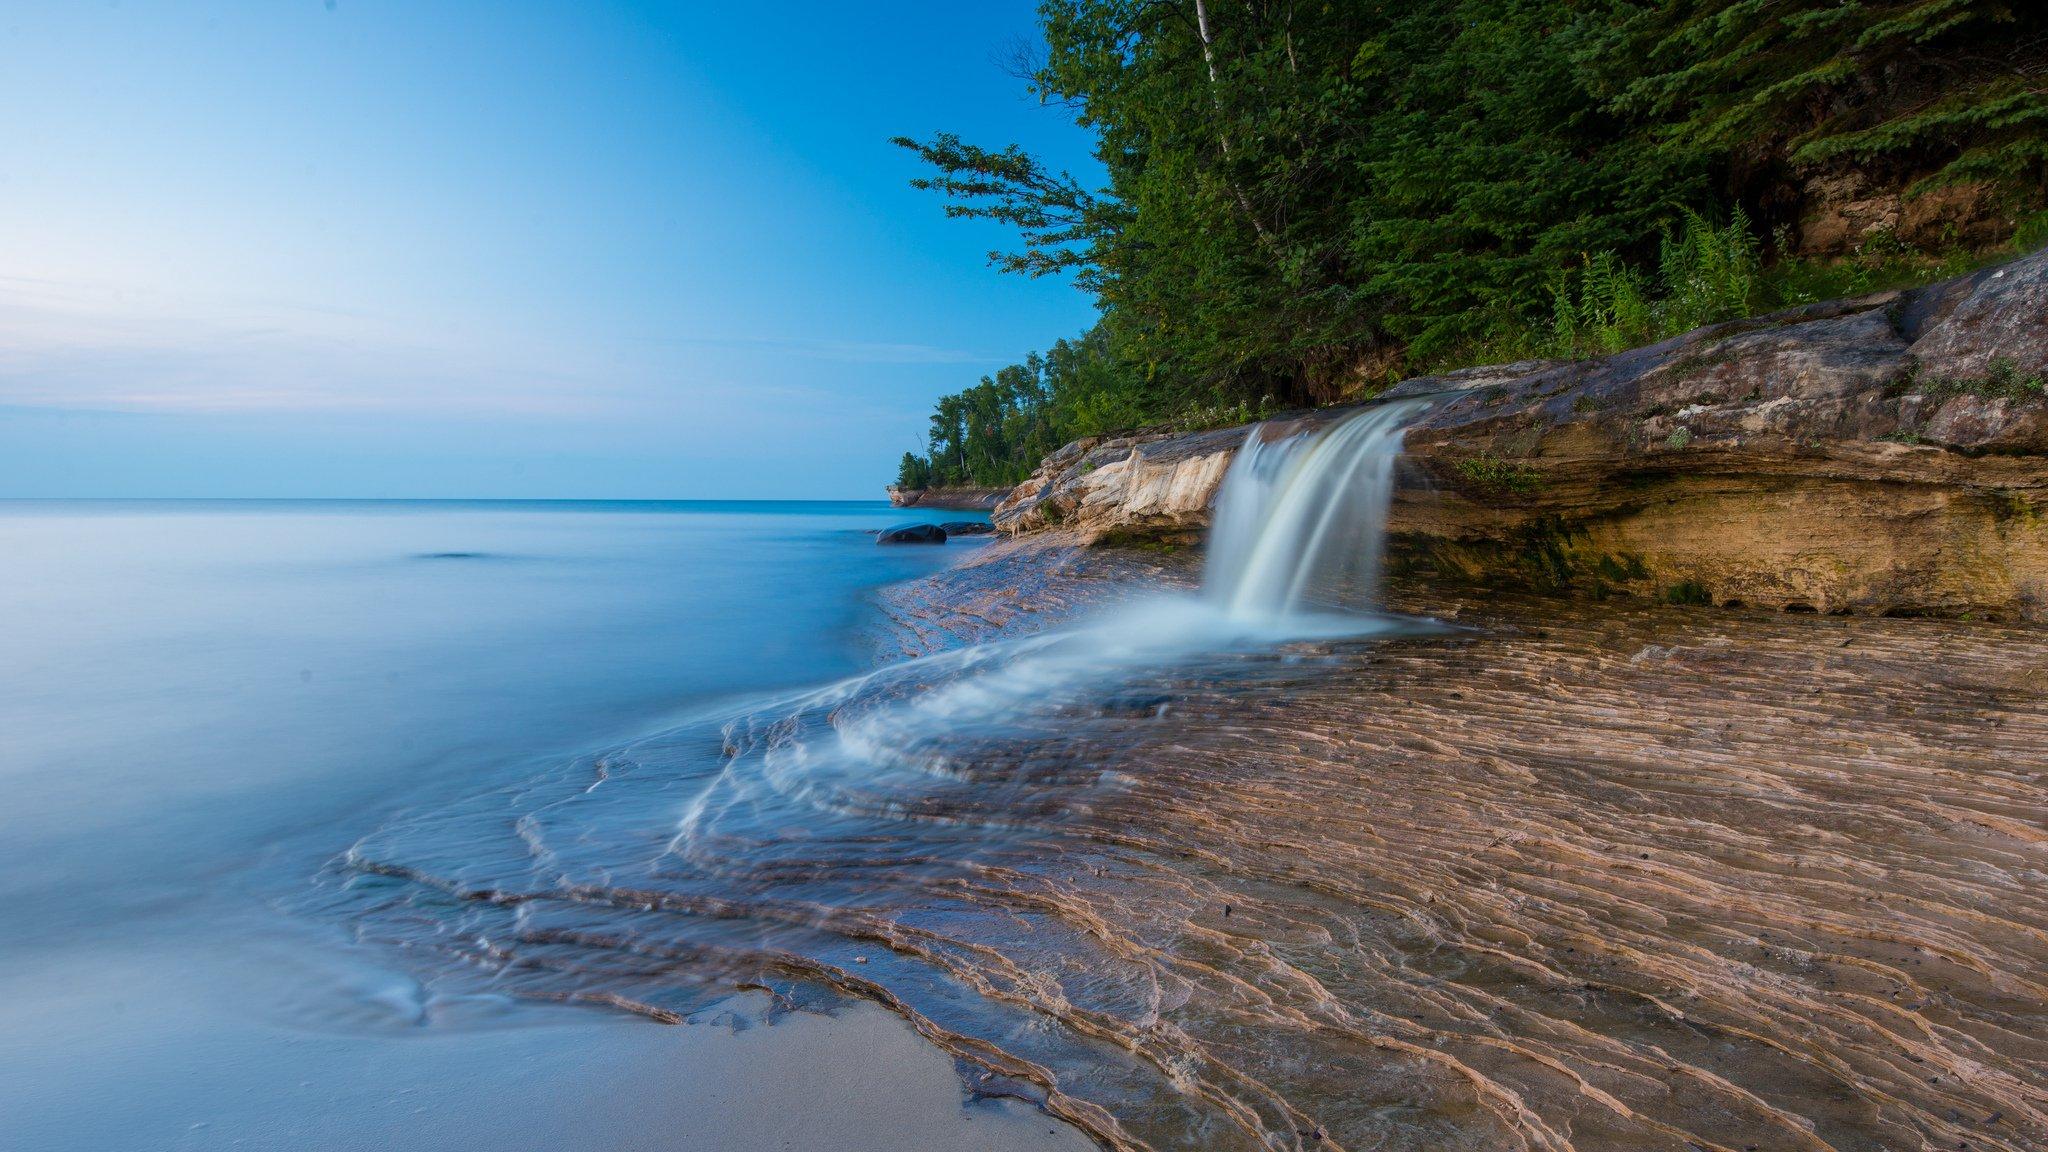 водопад деревья озеро  № 3898797 бесплатно